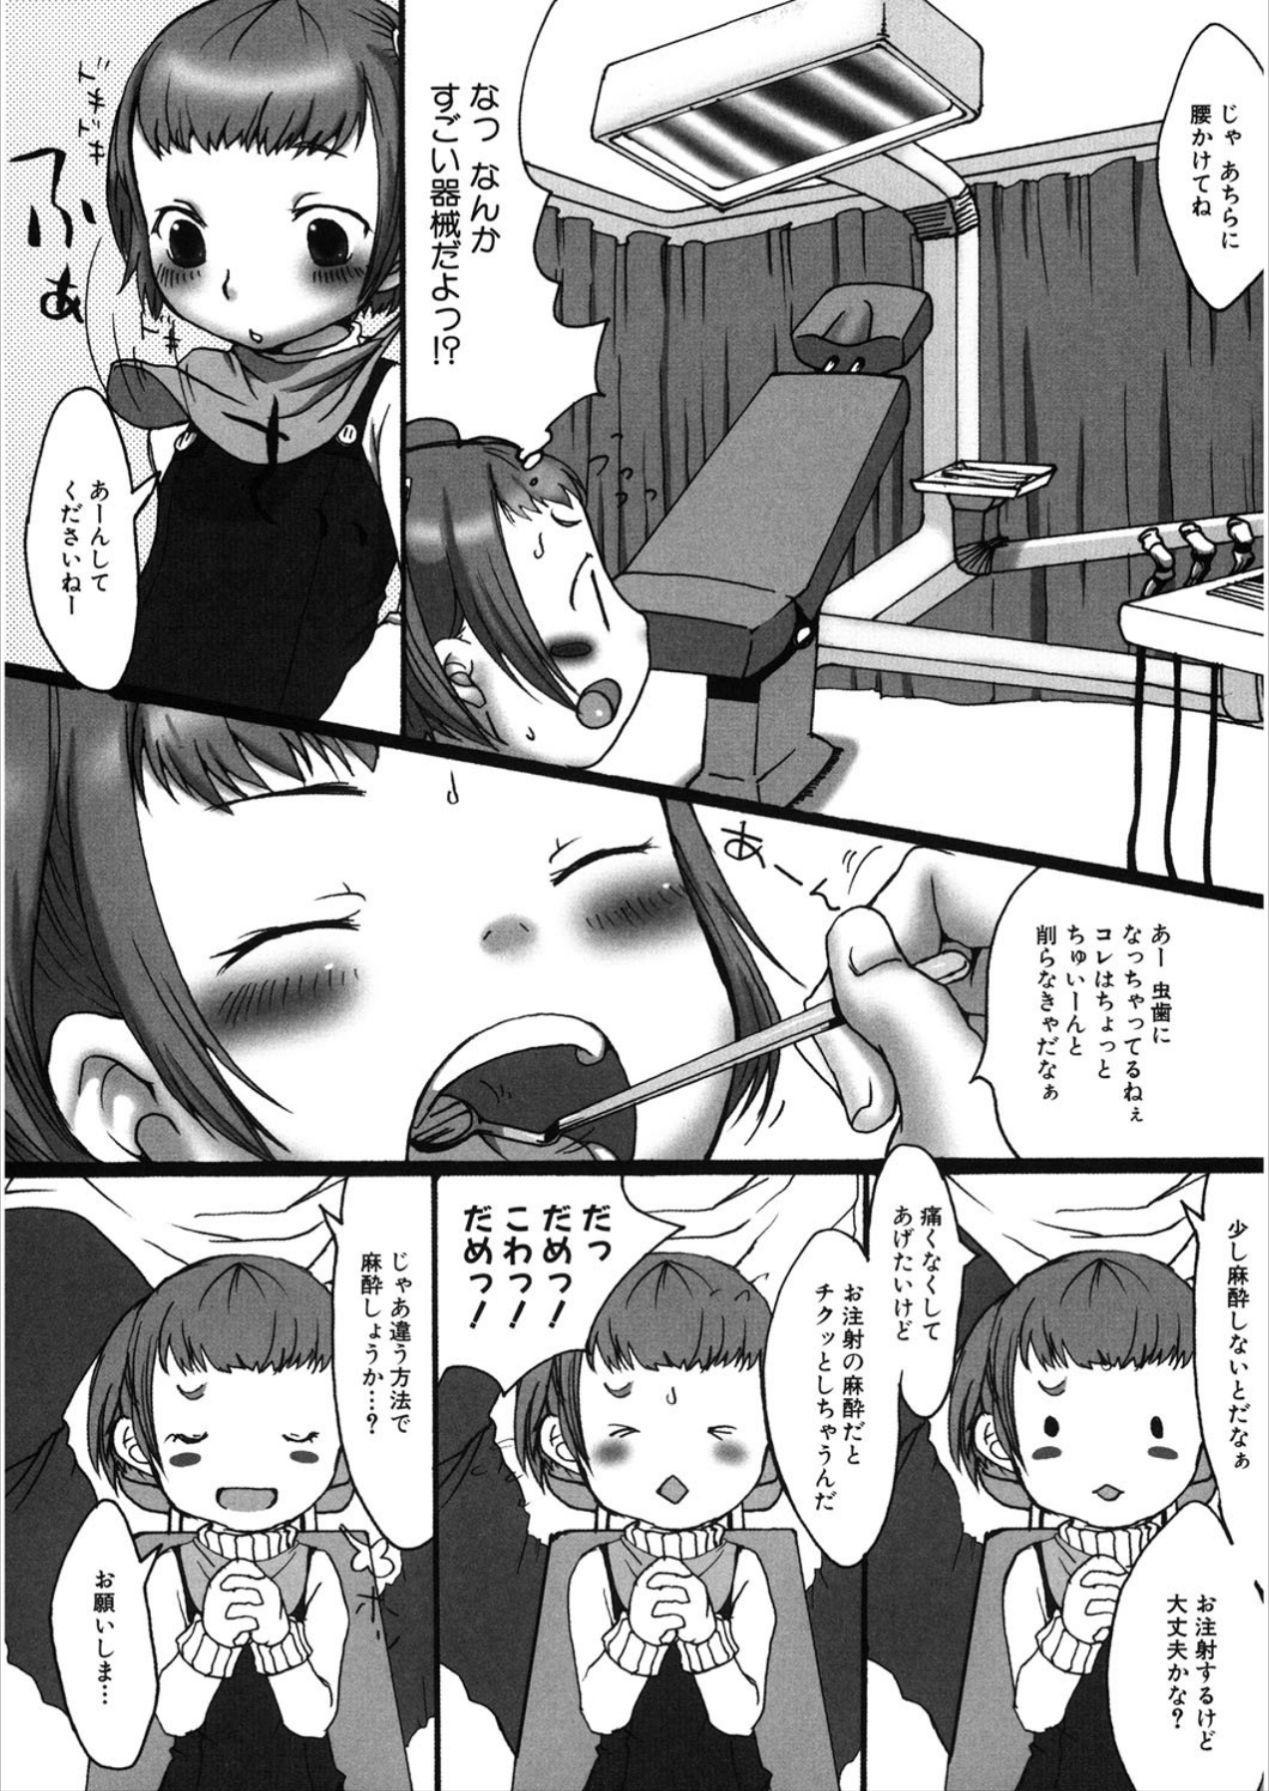 [Anthology] LQ -Little Queen- Vol. 21 [Digital] 152